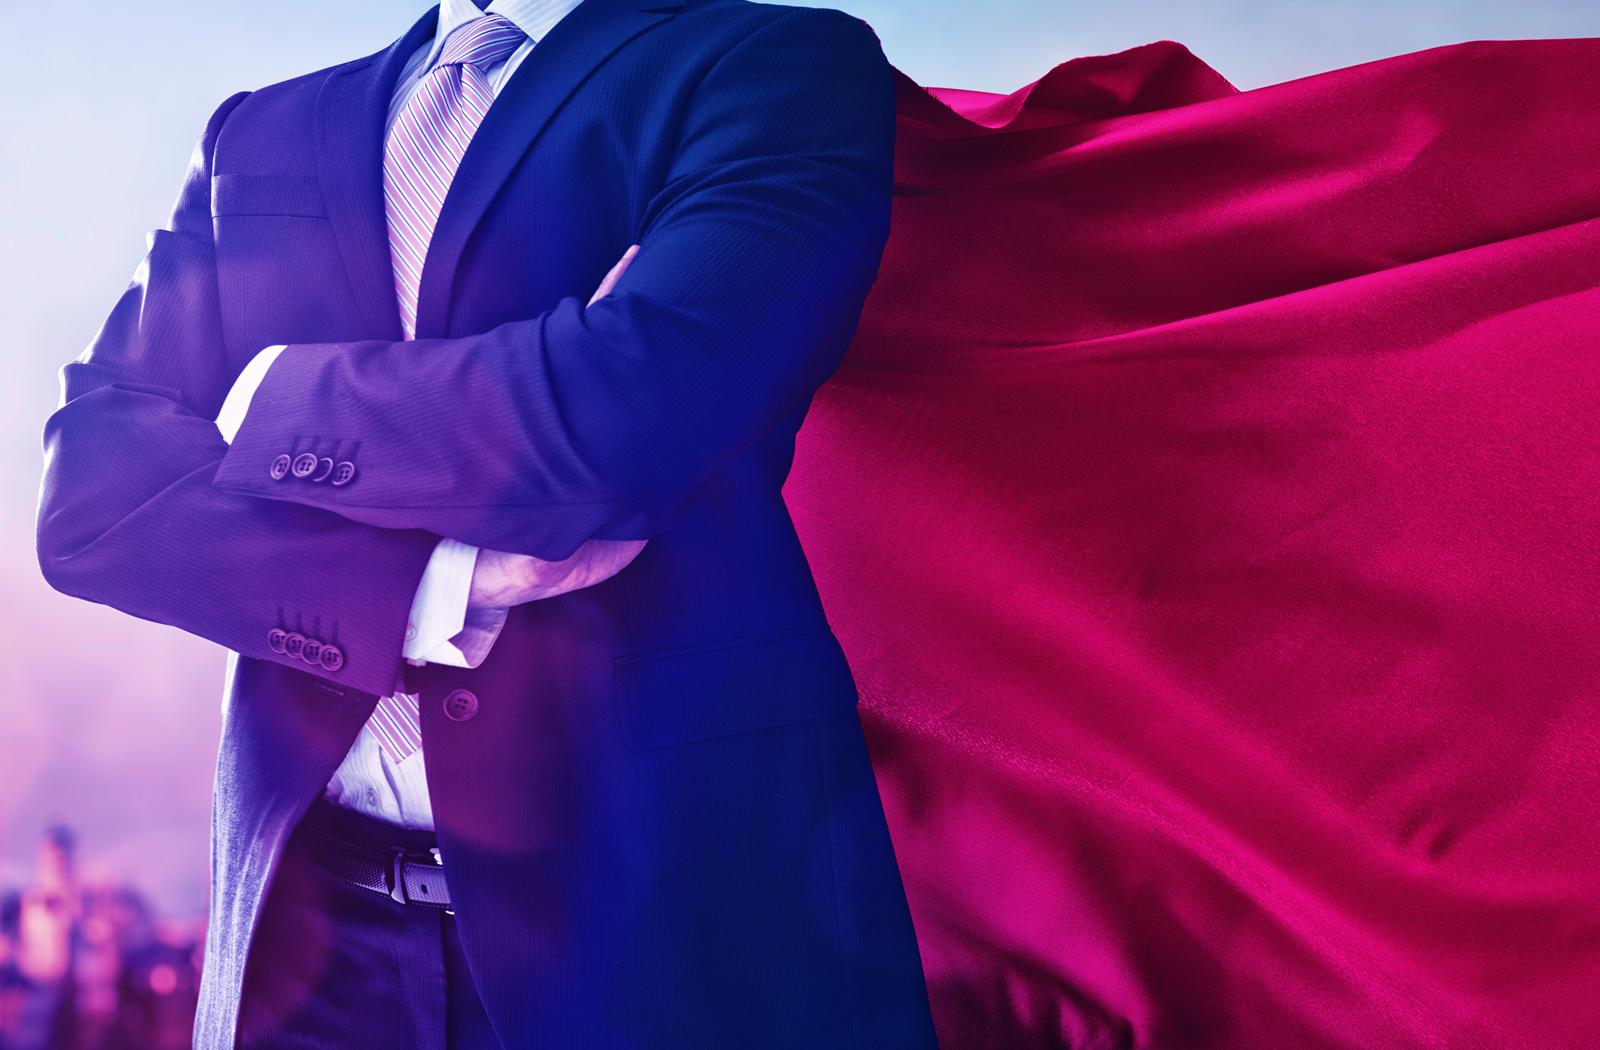 superman_1-1600x1050